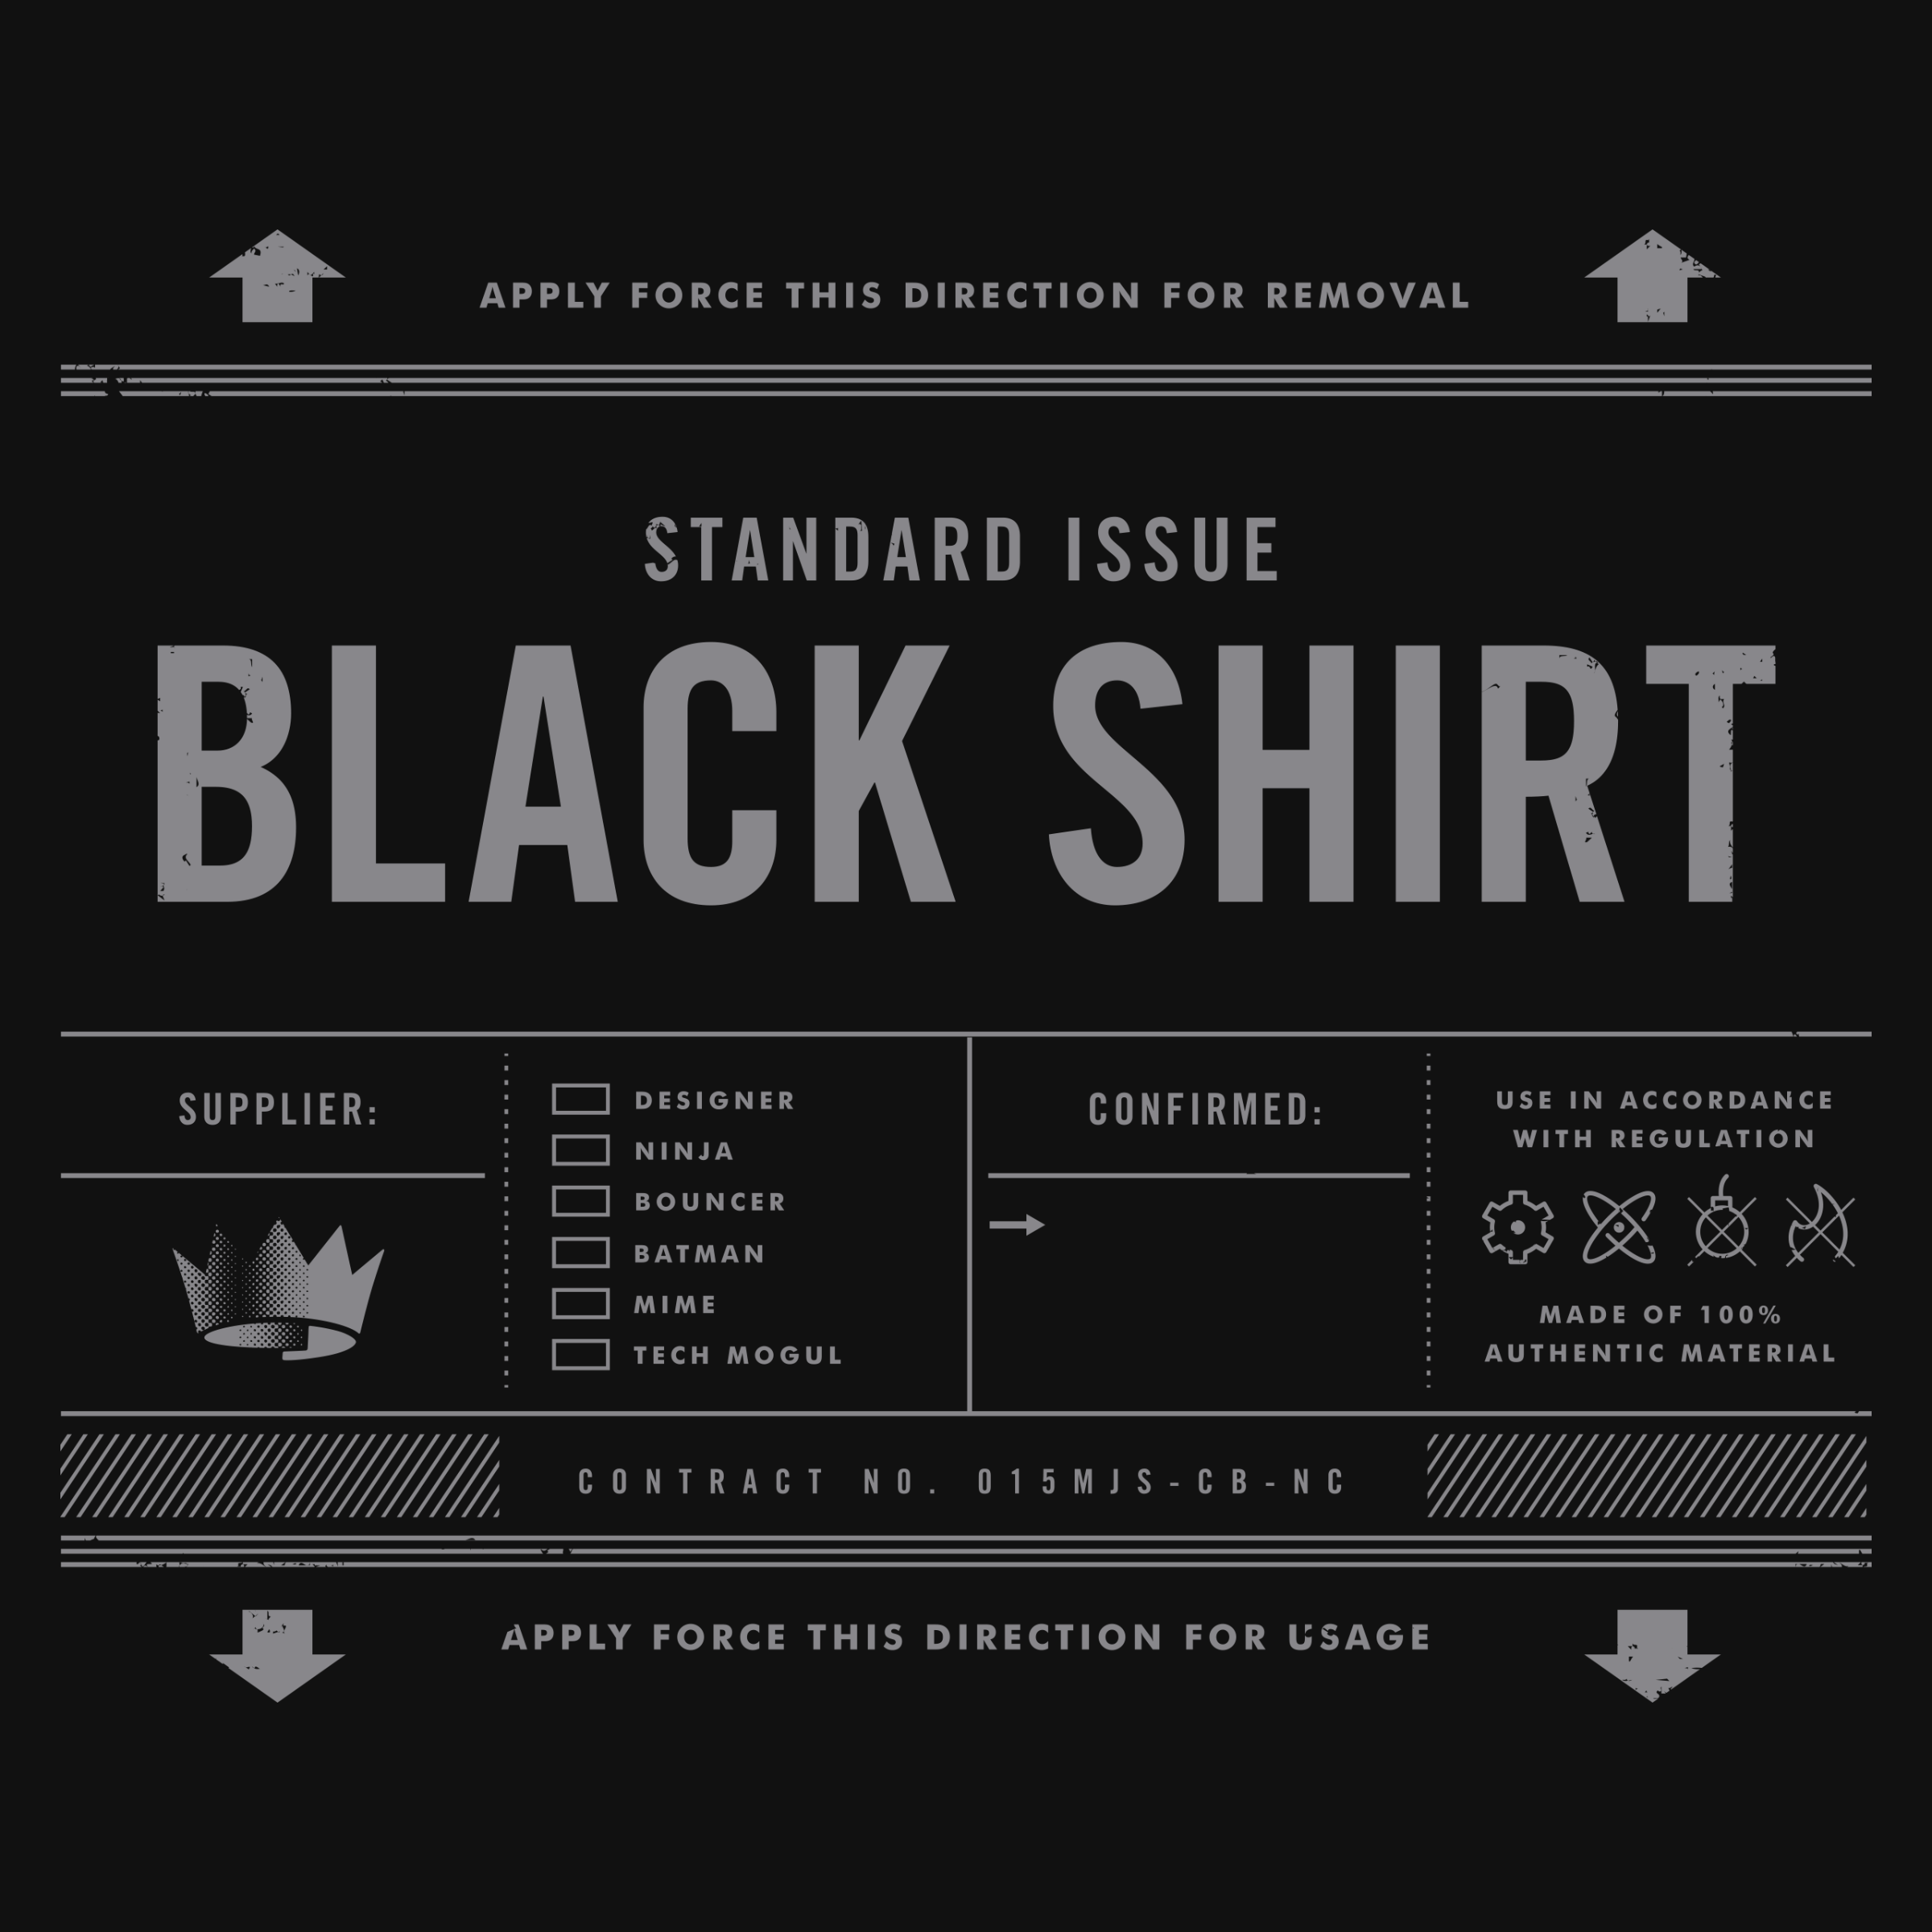 Standard Issue Black Shirt Detail